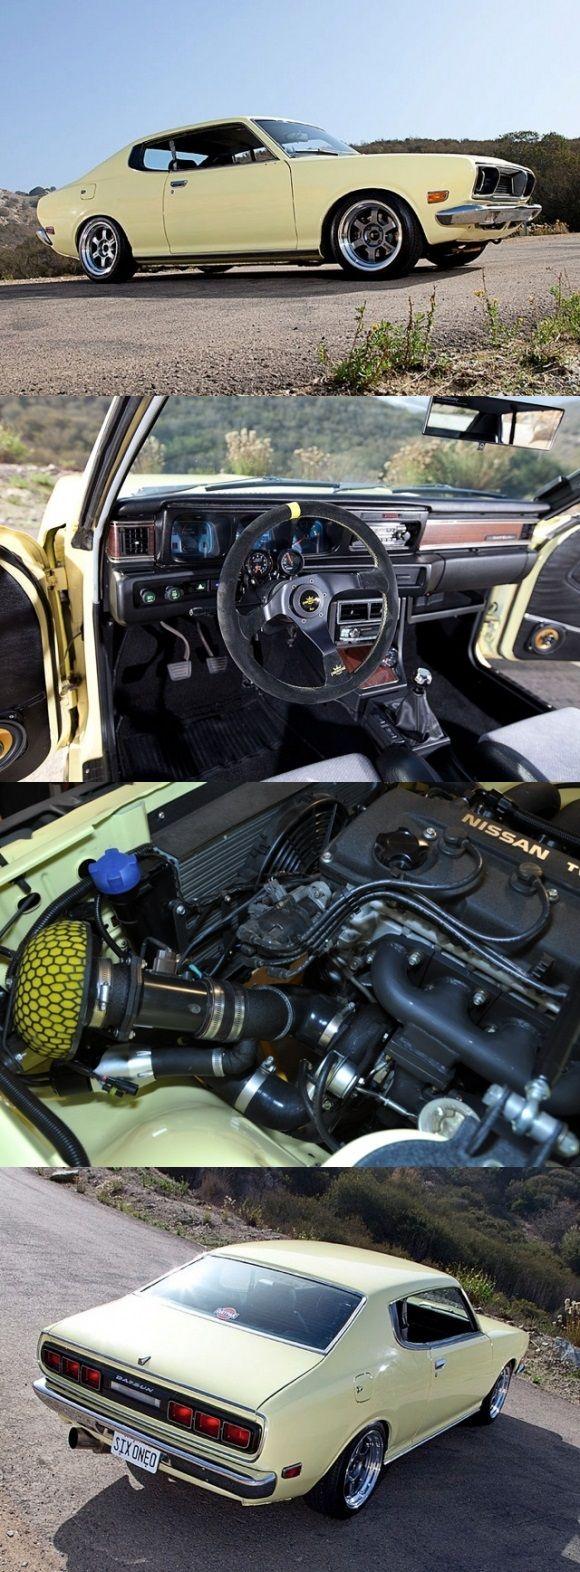 300hp 1974 Datsun 610 Turbo | Nissan/Datsun | Pinterest ...